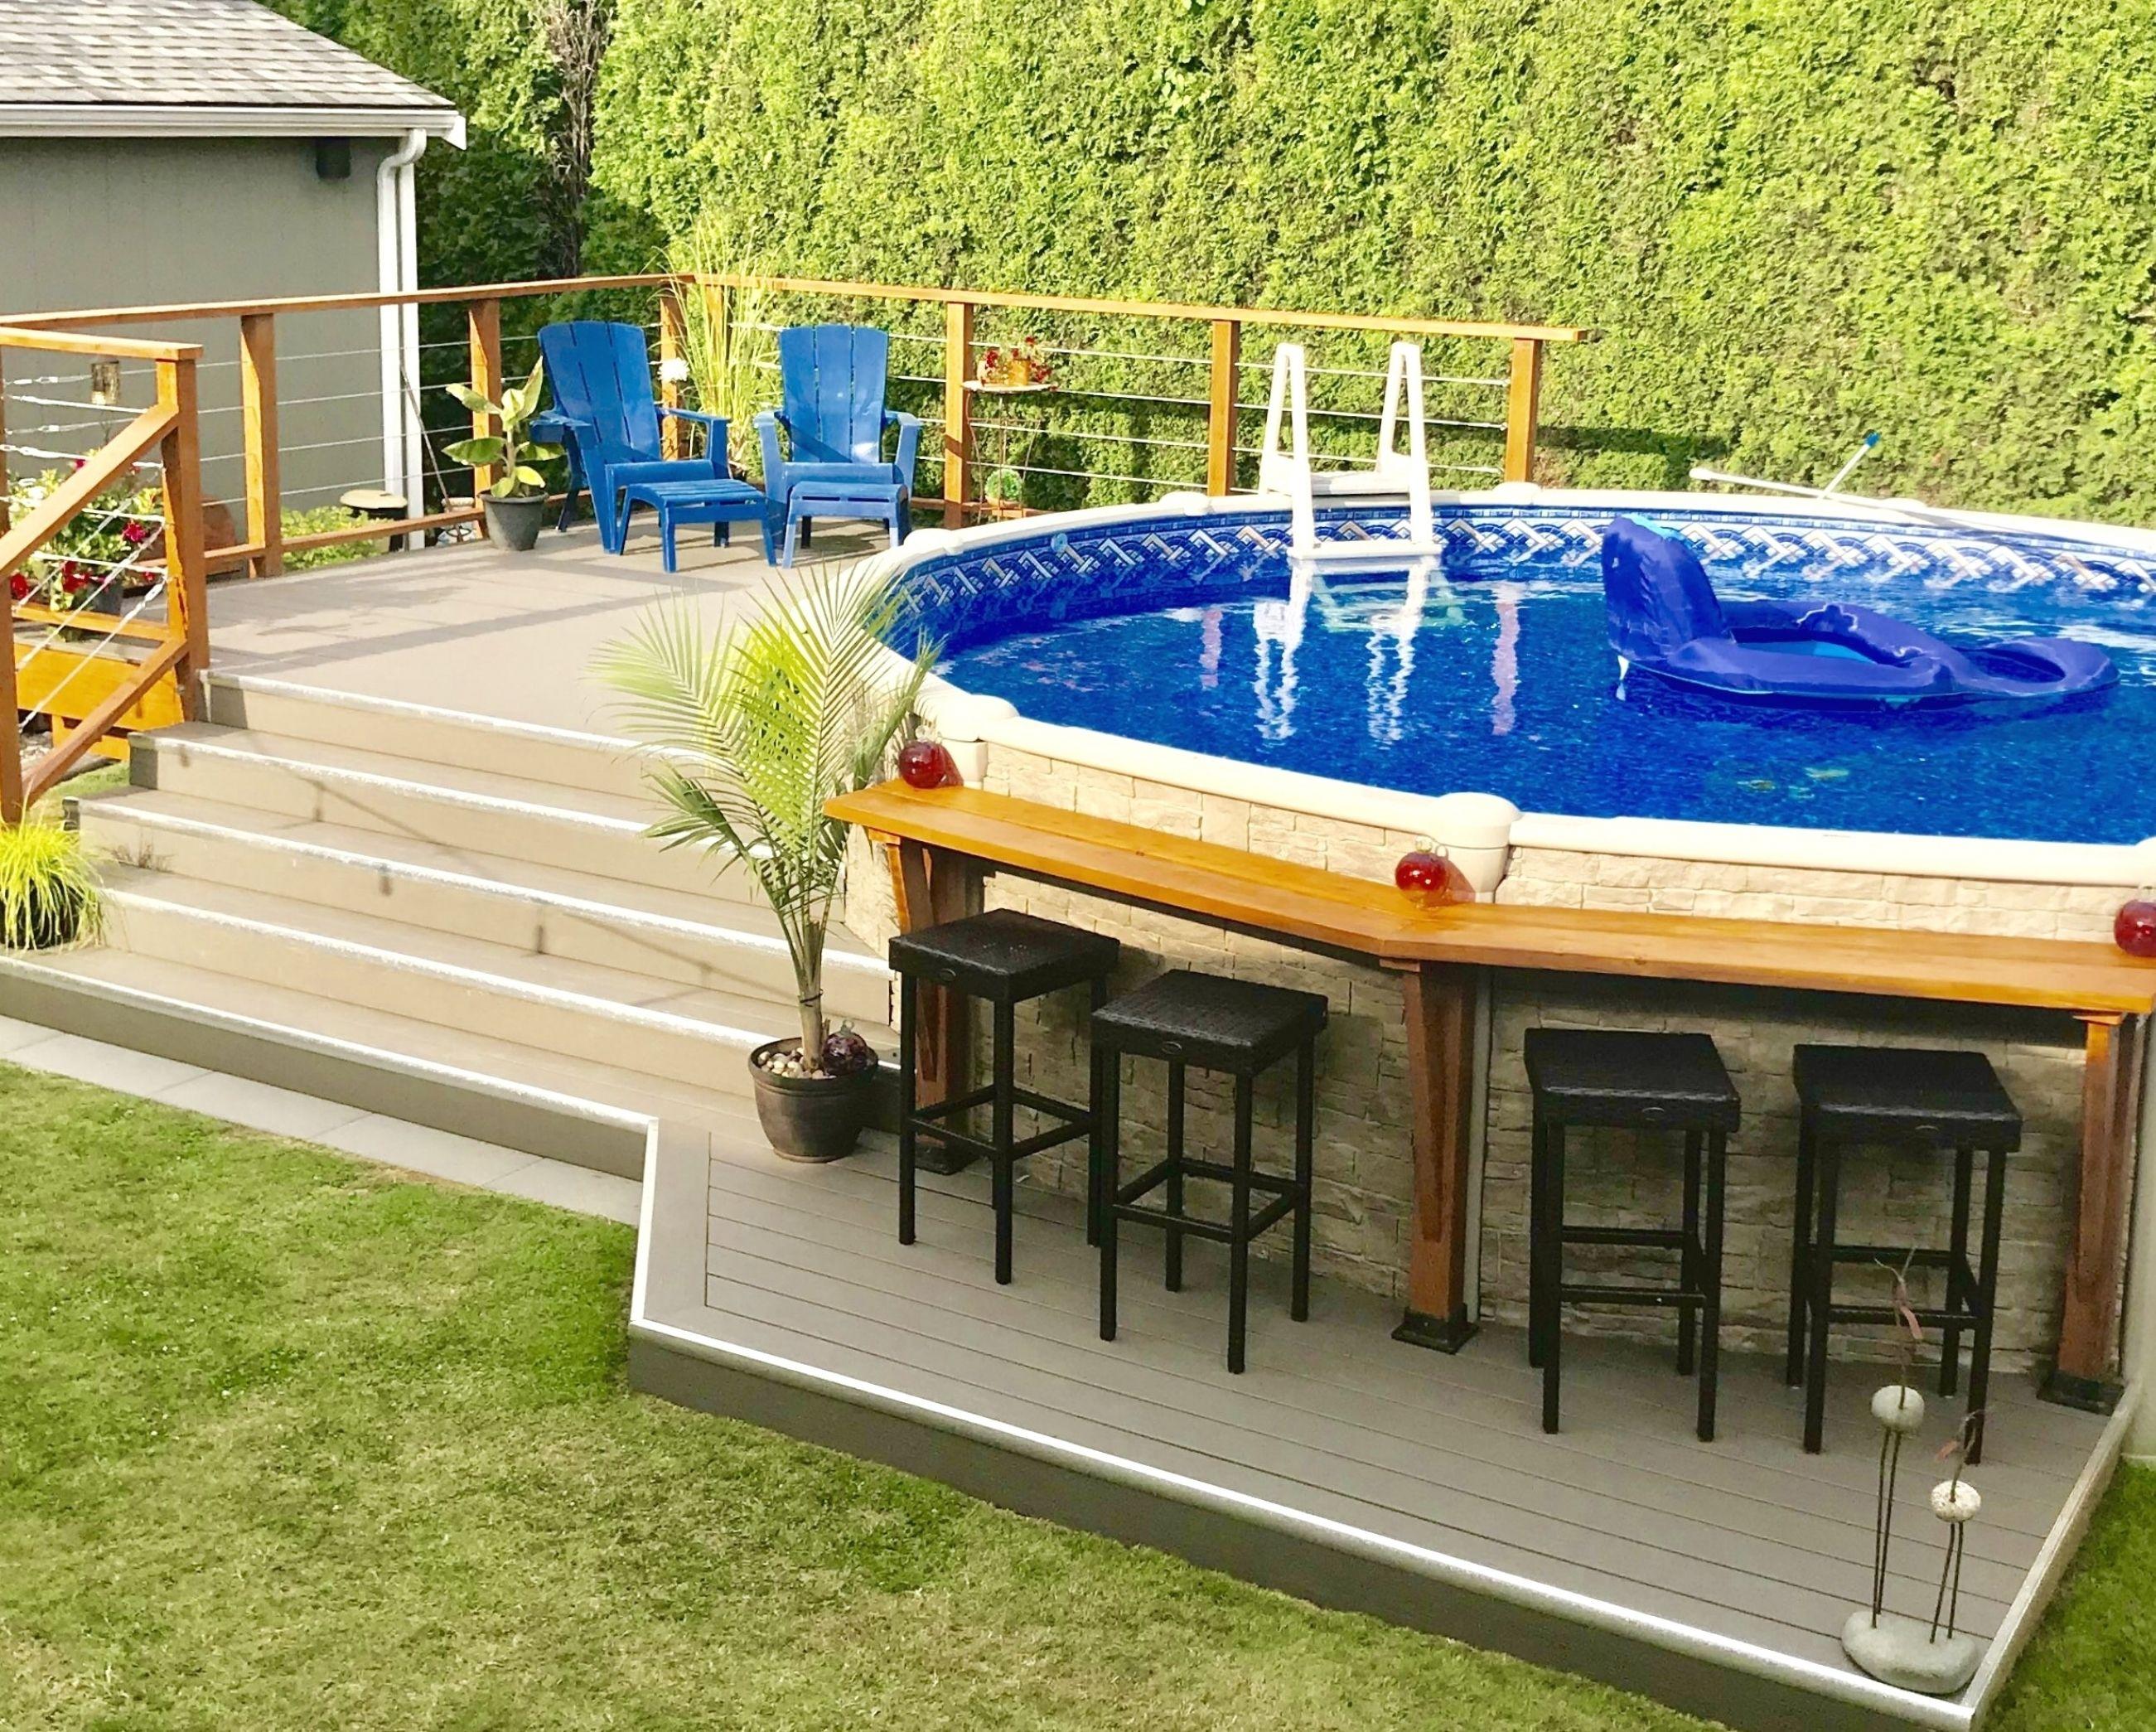 Divingplatformtips Backyard Pool Landscaping Backyard Pool Pool Landscaping